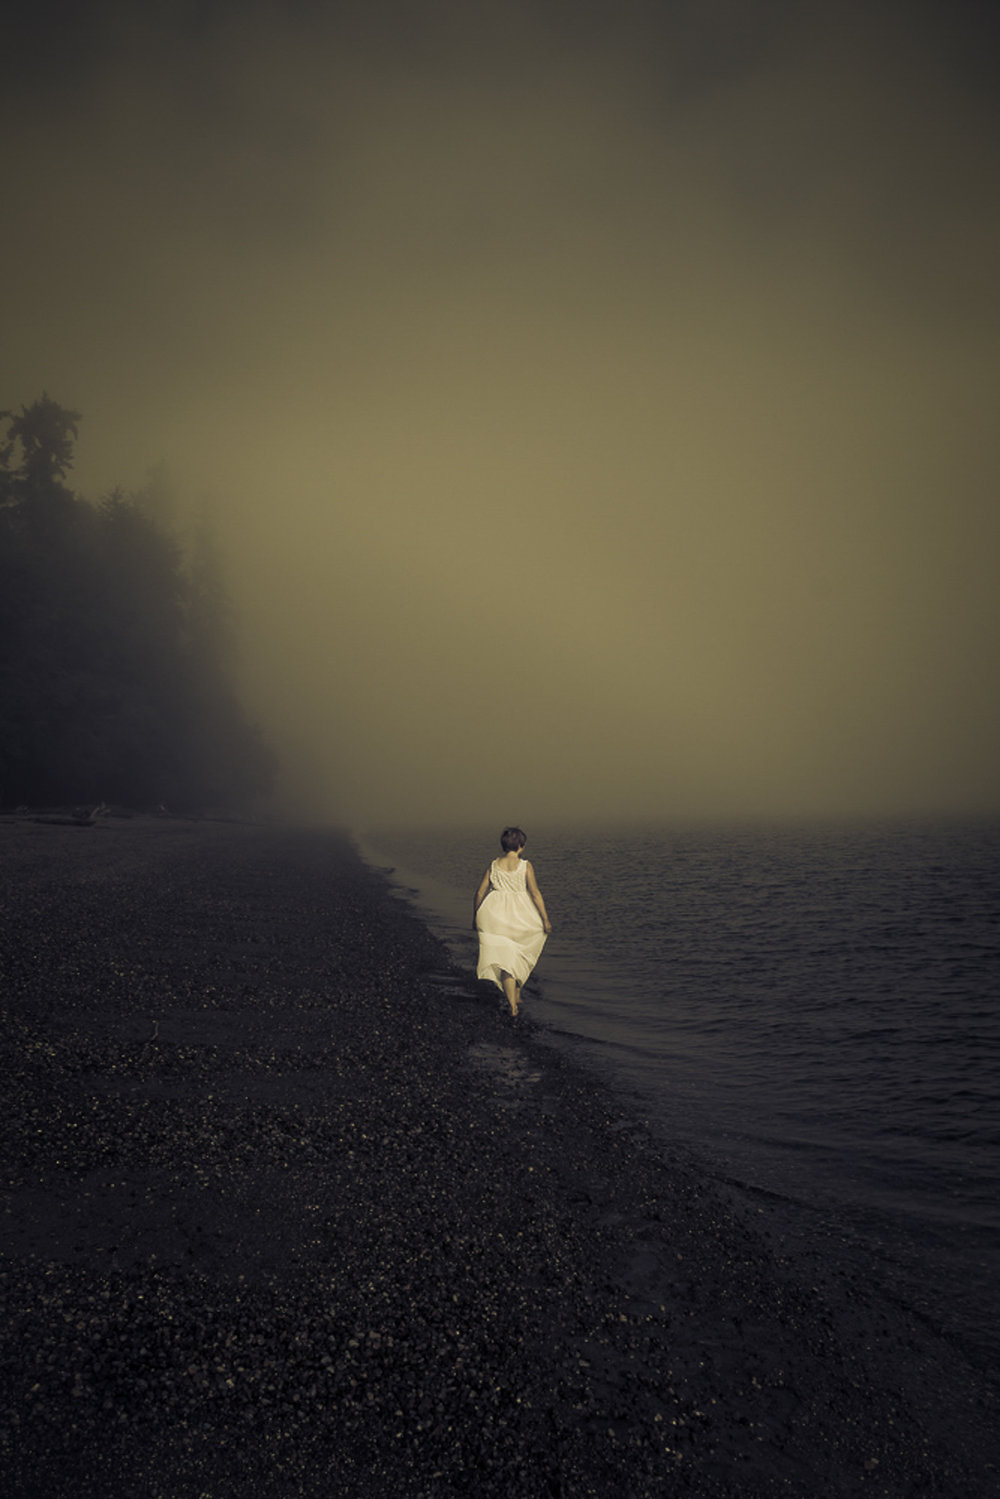 sarahbsmithart-dreams-ghosts-.jpg